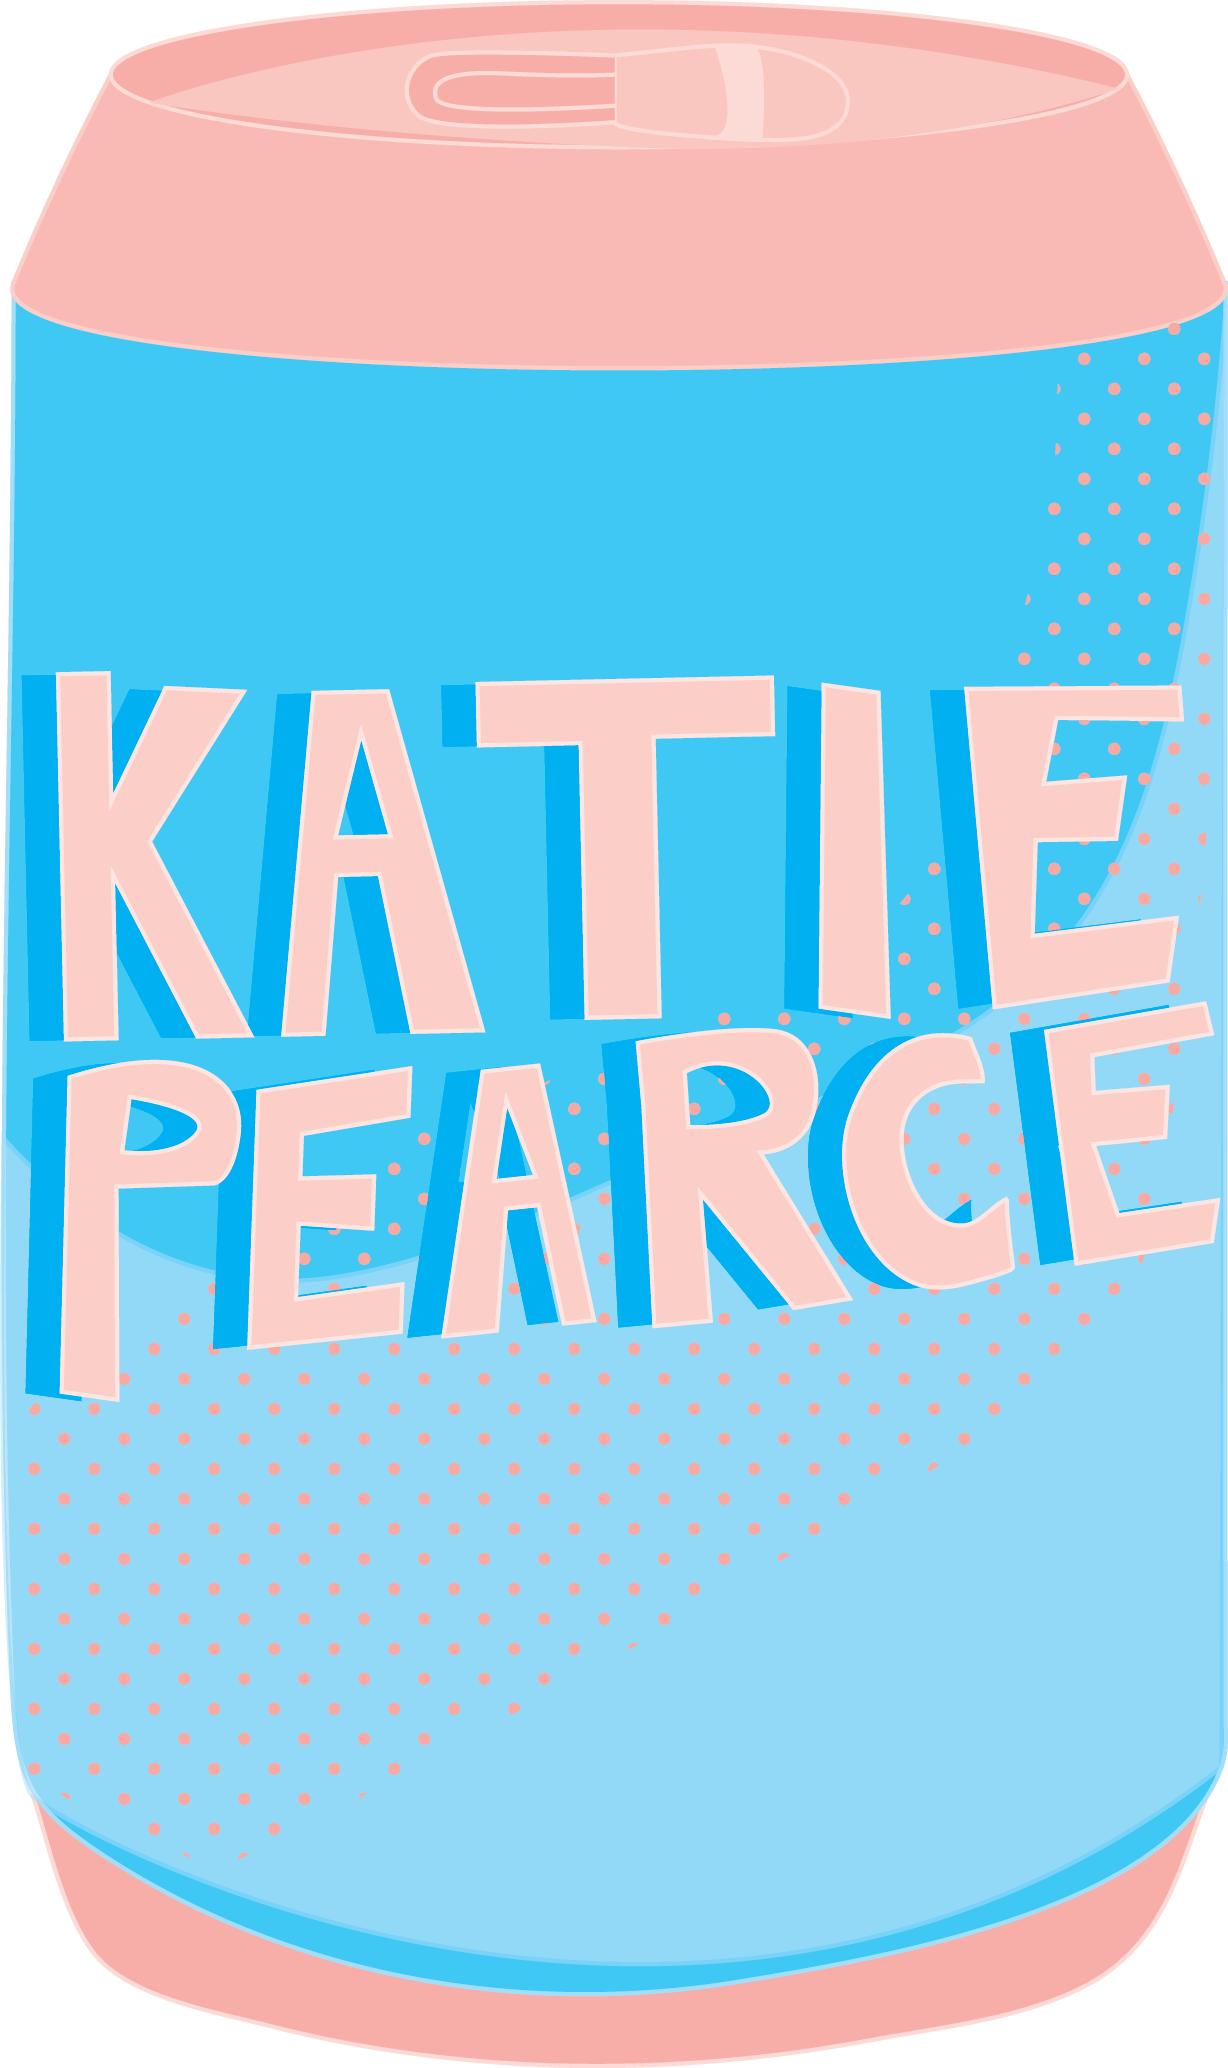 Katie Pearce